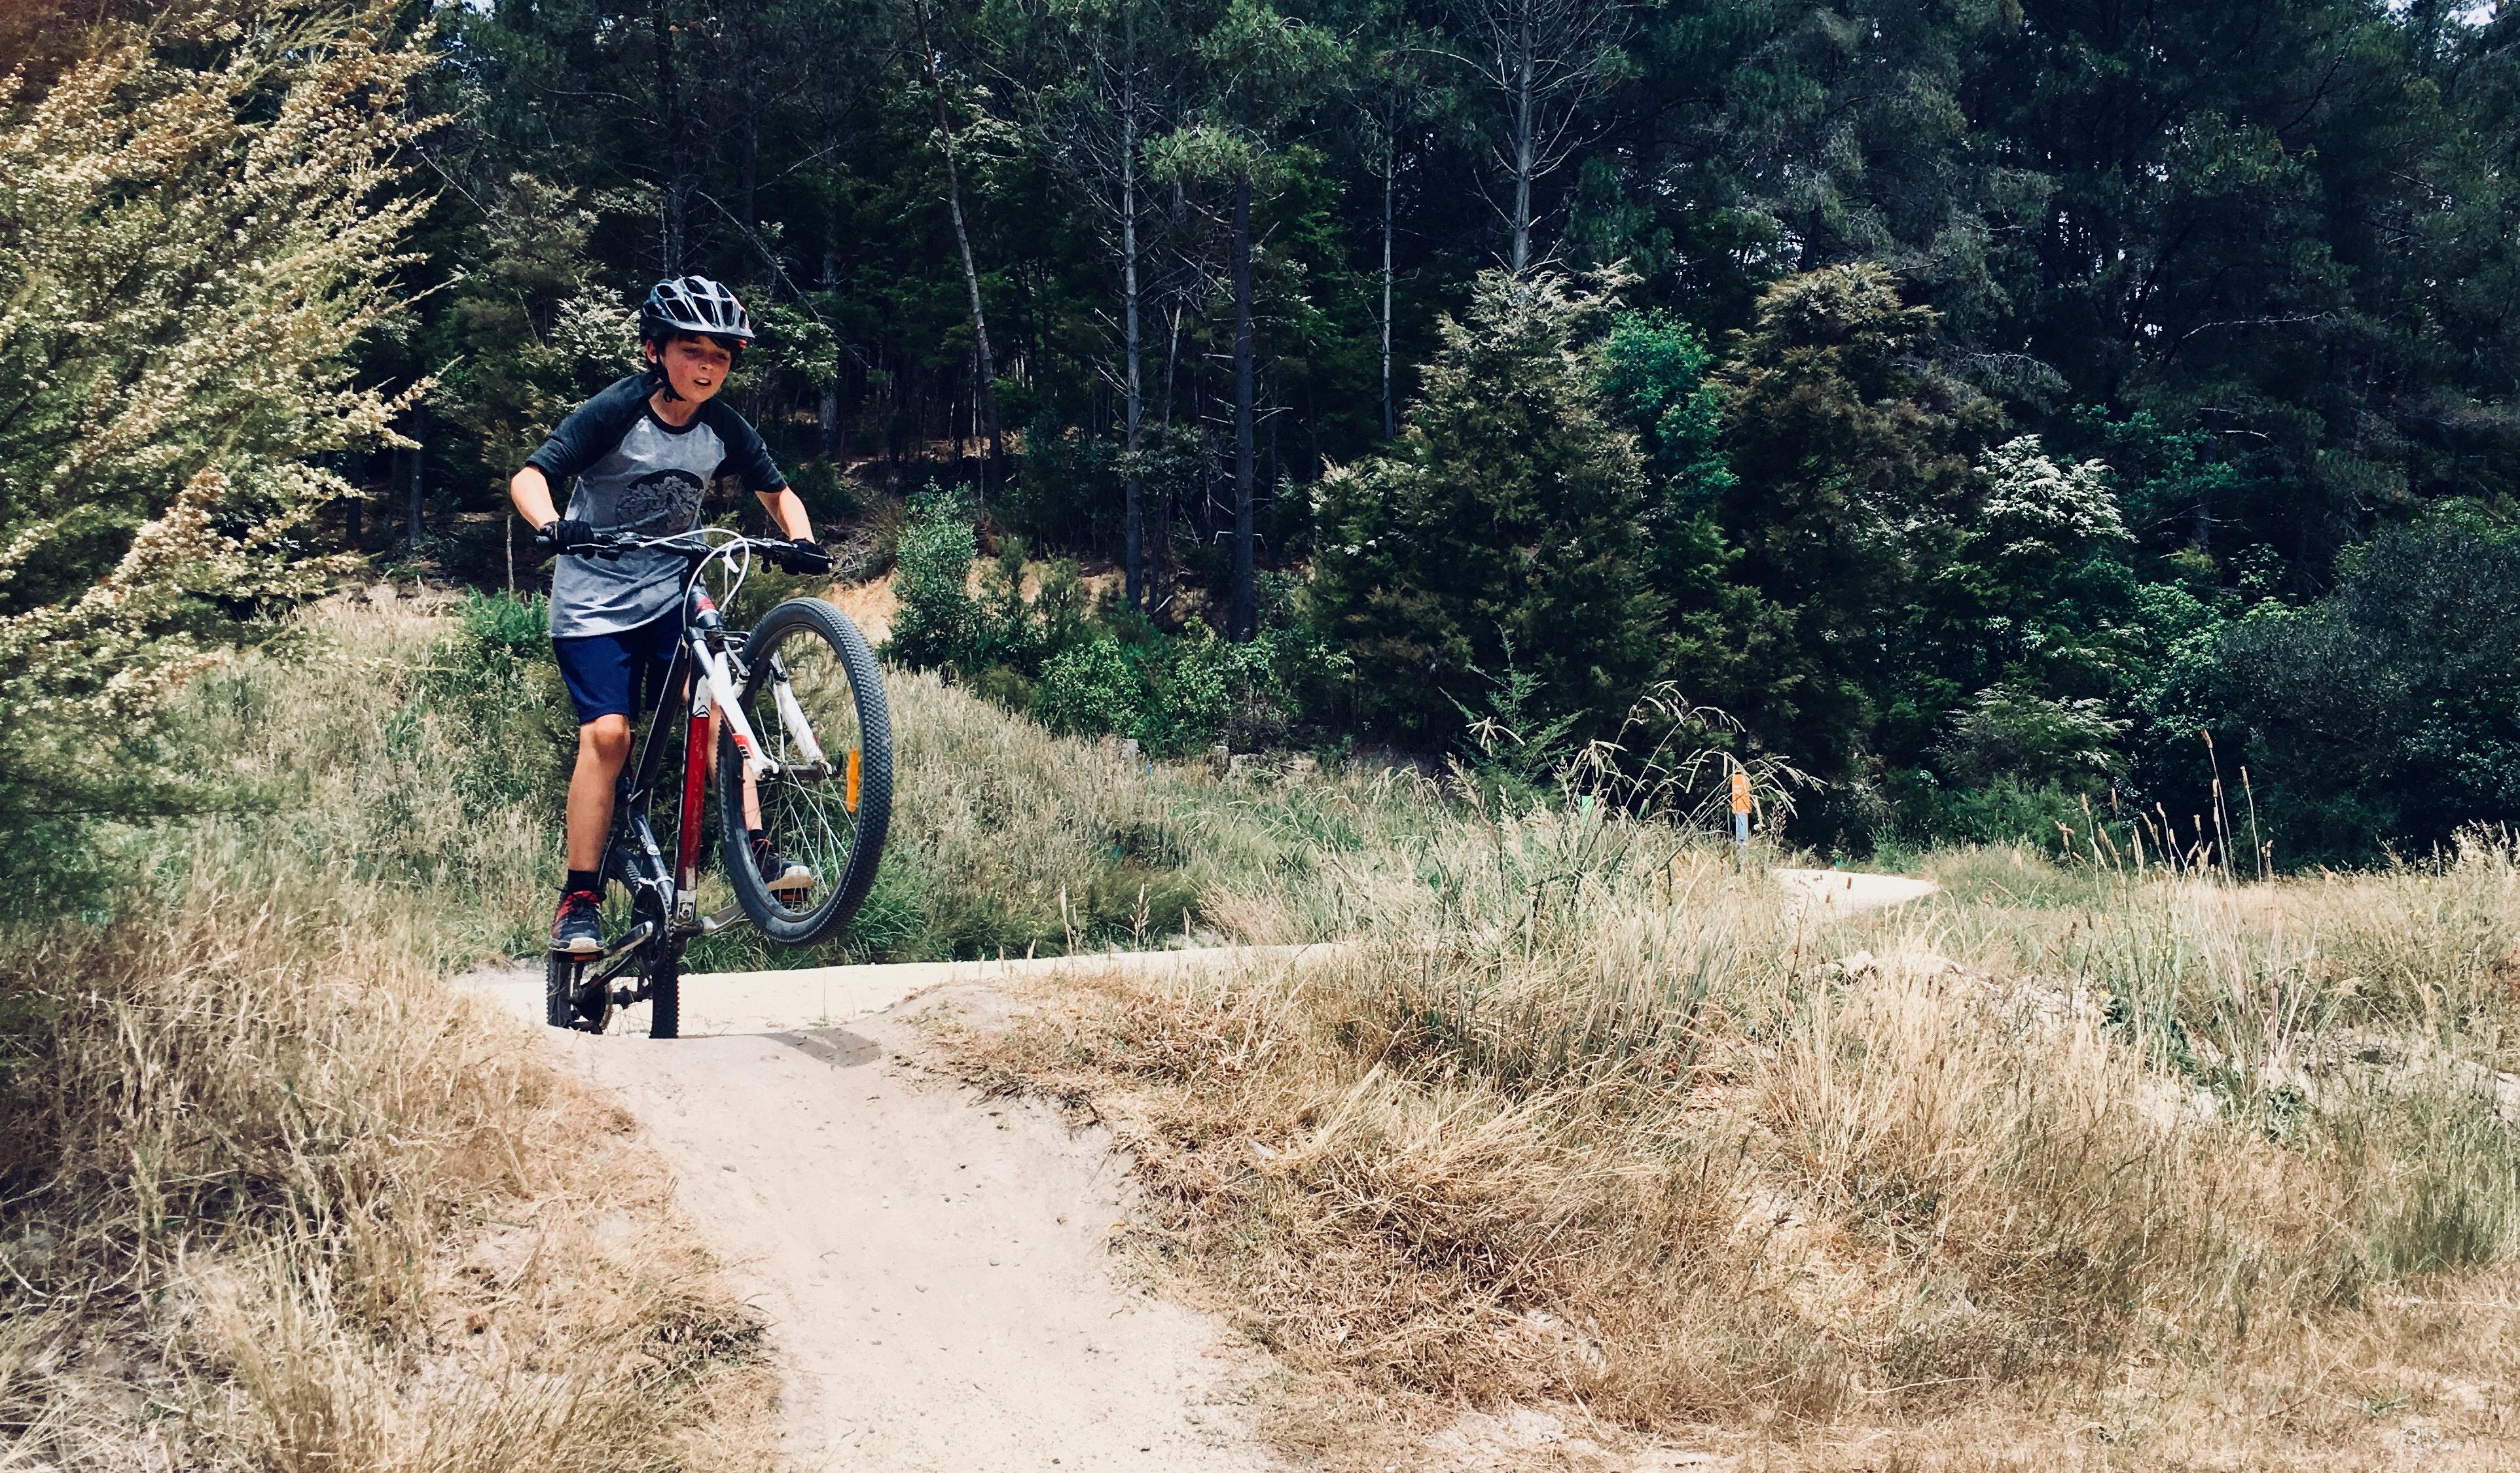 Best Mountain Bike For Short Riders